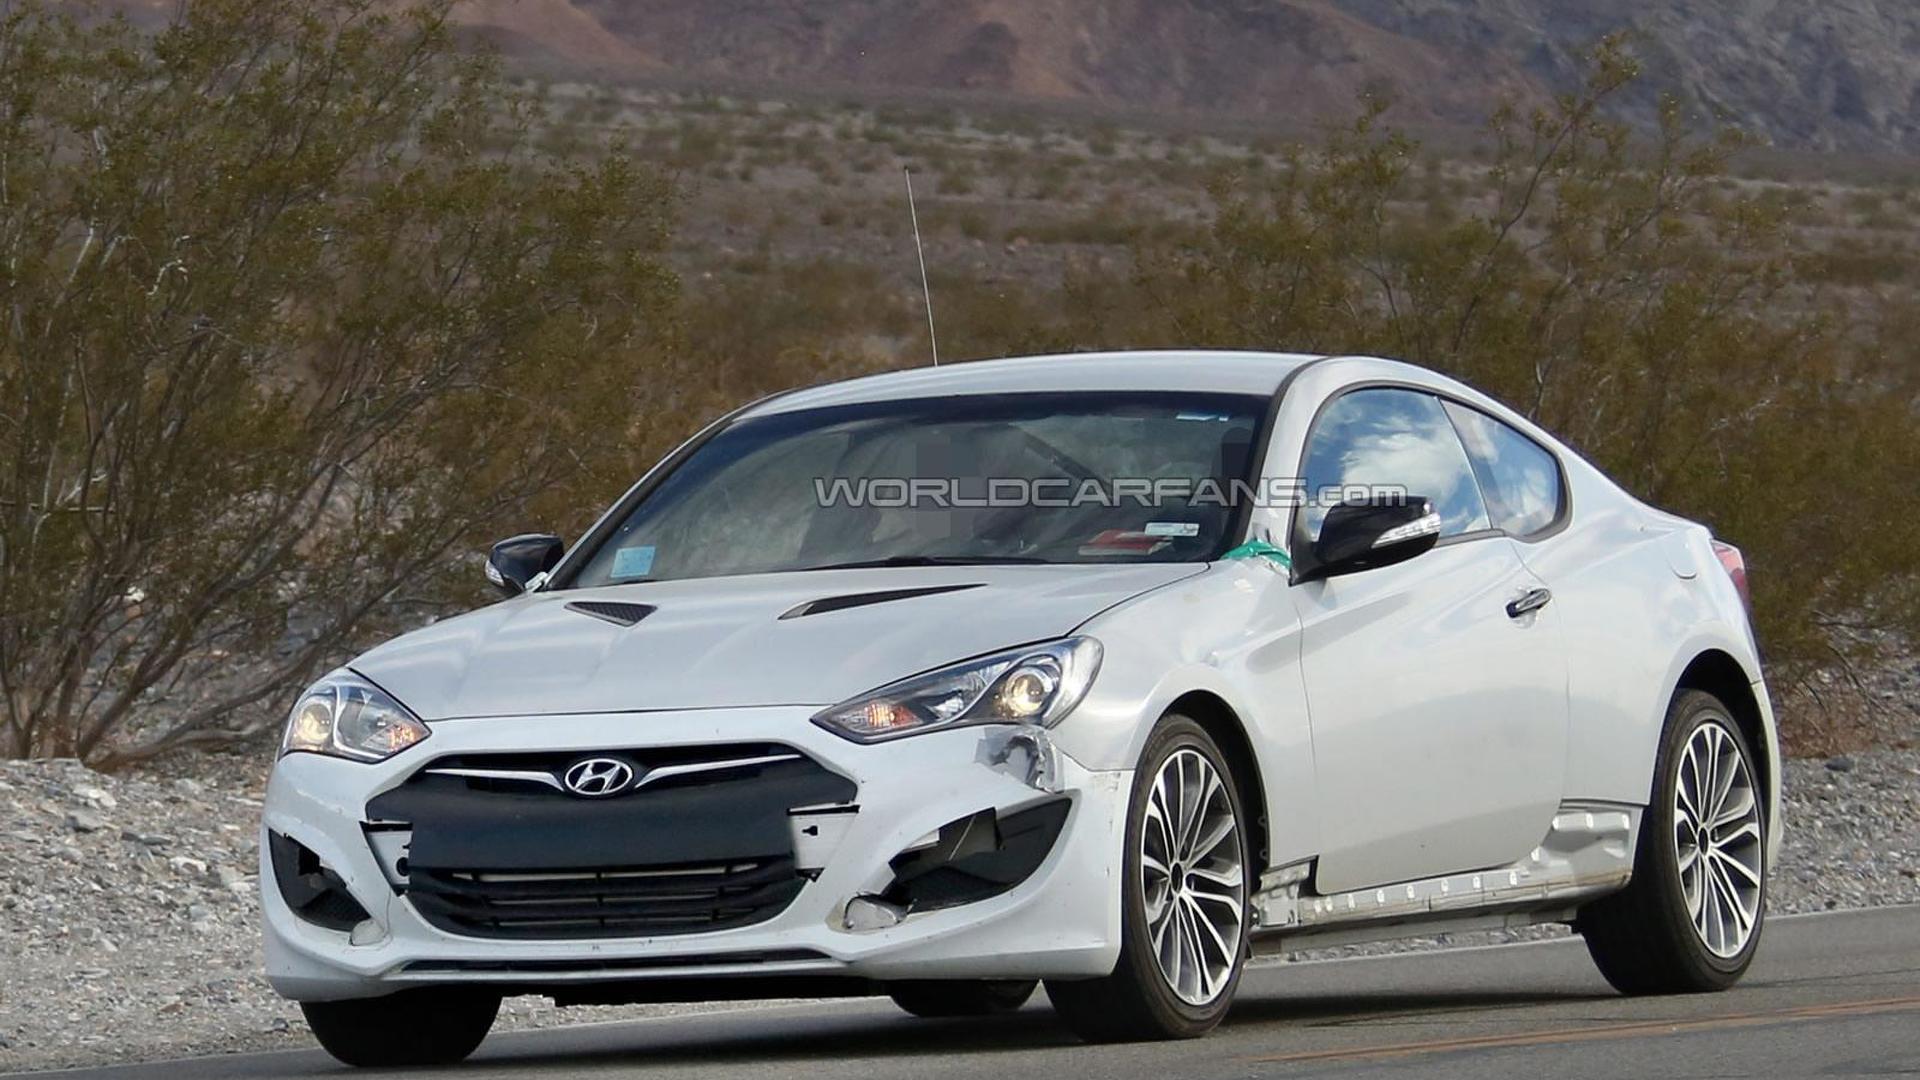 2016 Hyundai Genesis Coupe >> 2016 Hyundai Genesis Coupe Spied